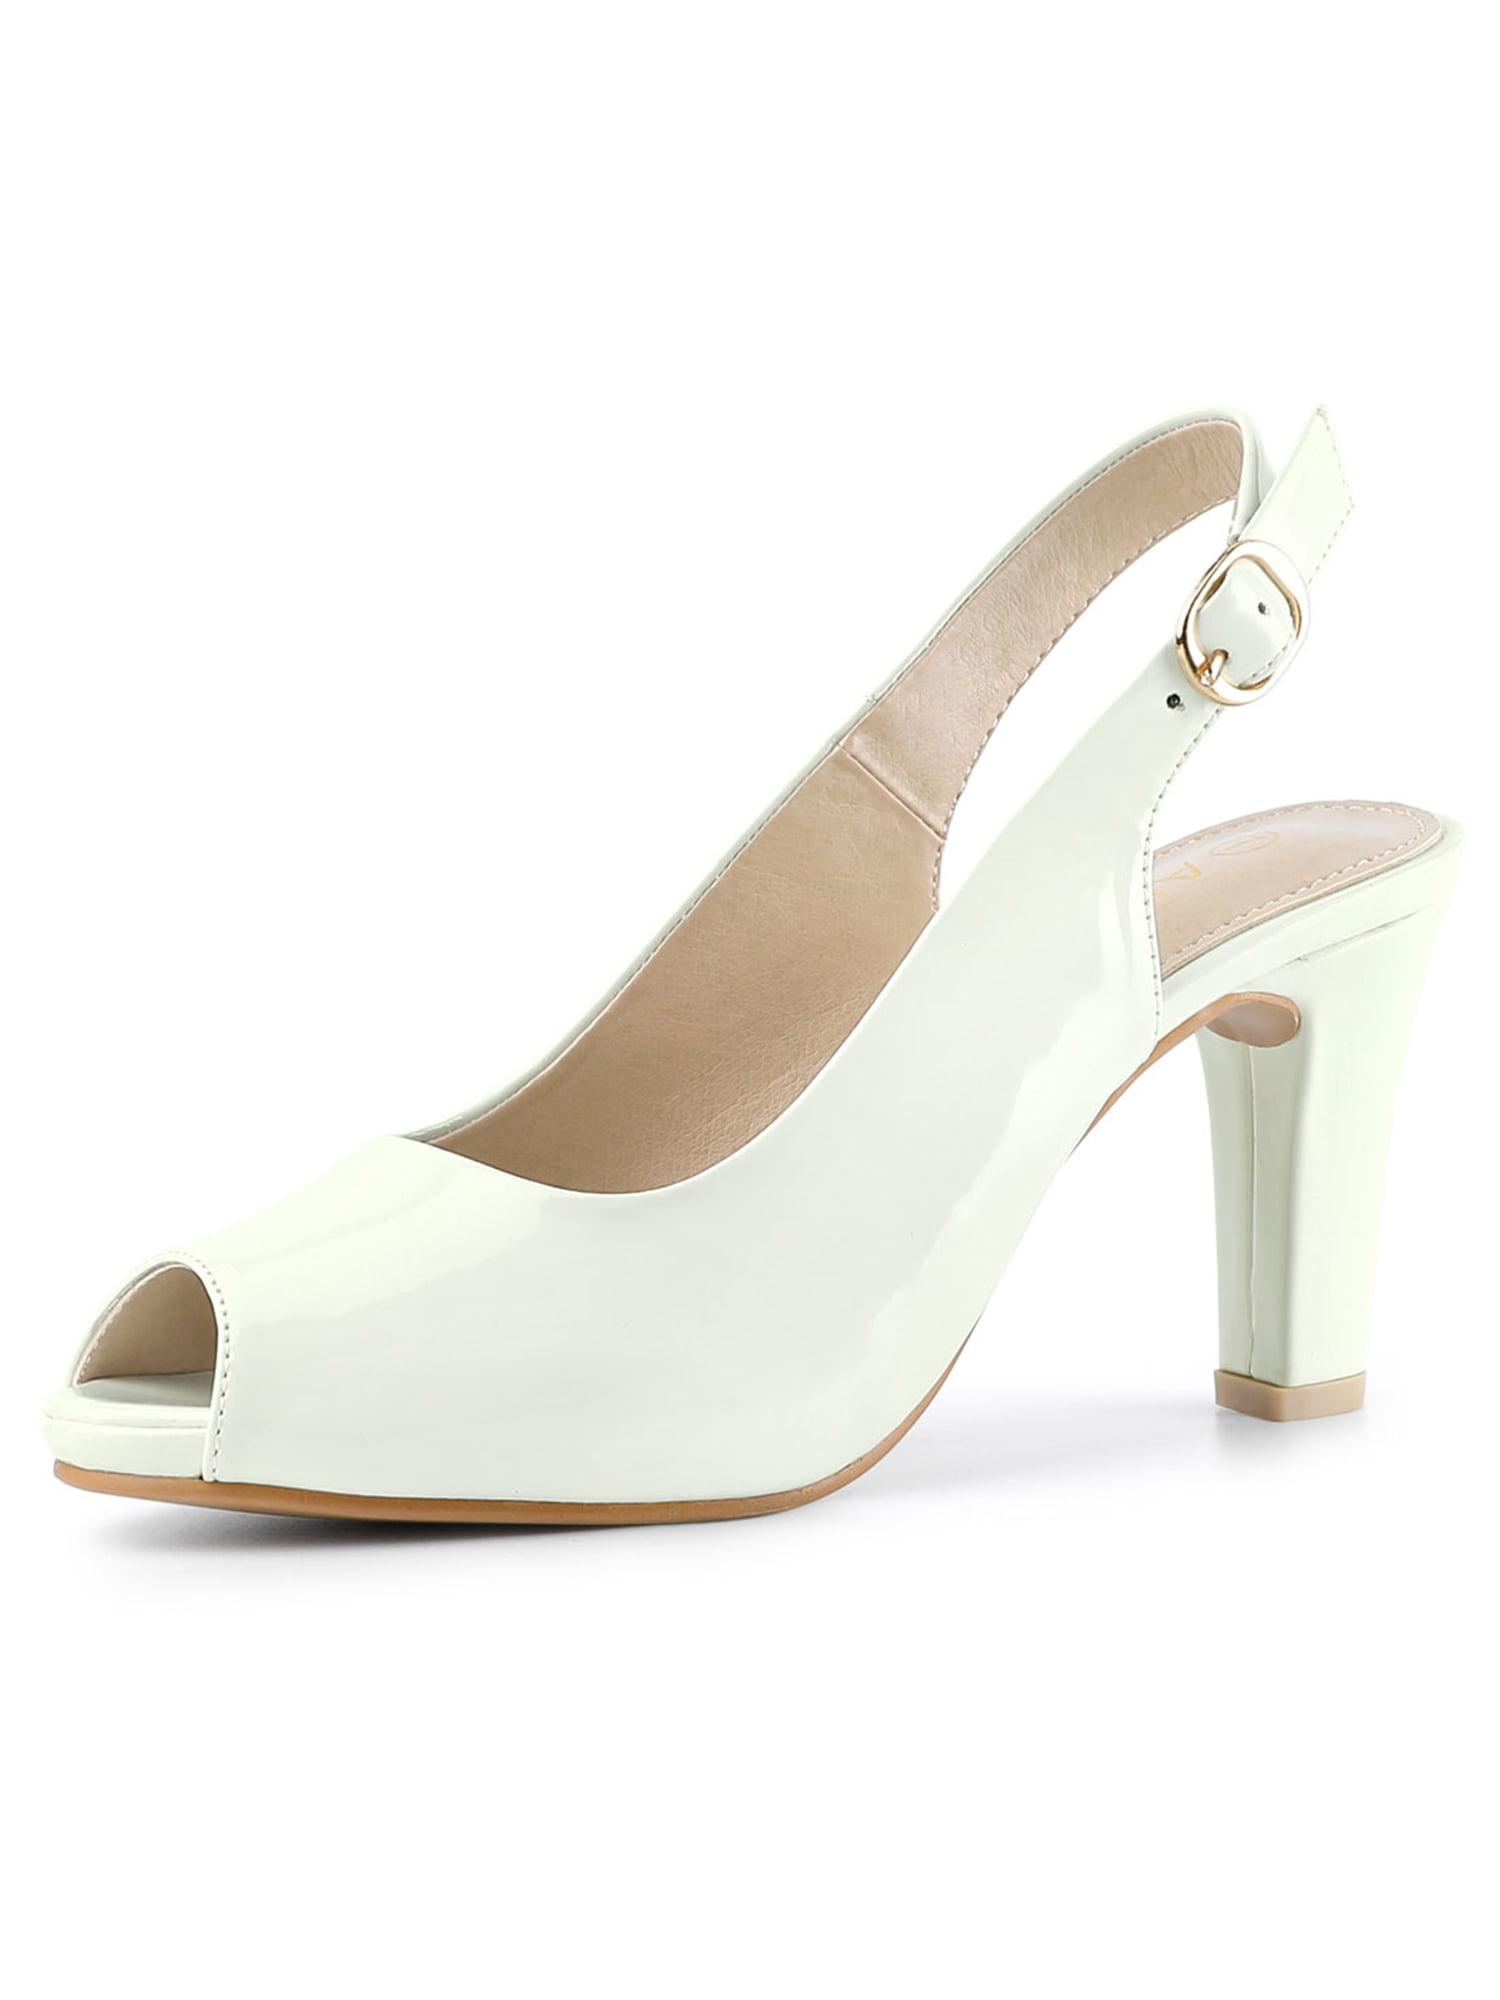 Allegra K Women's Peep Toe Ankle Strap